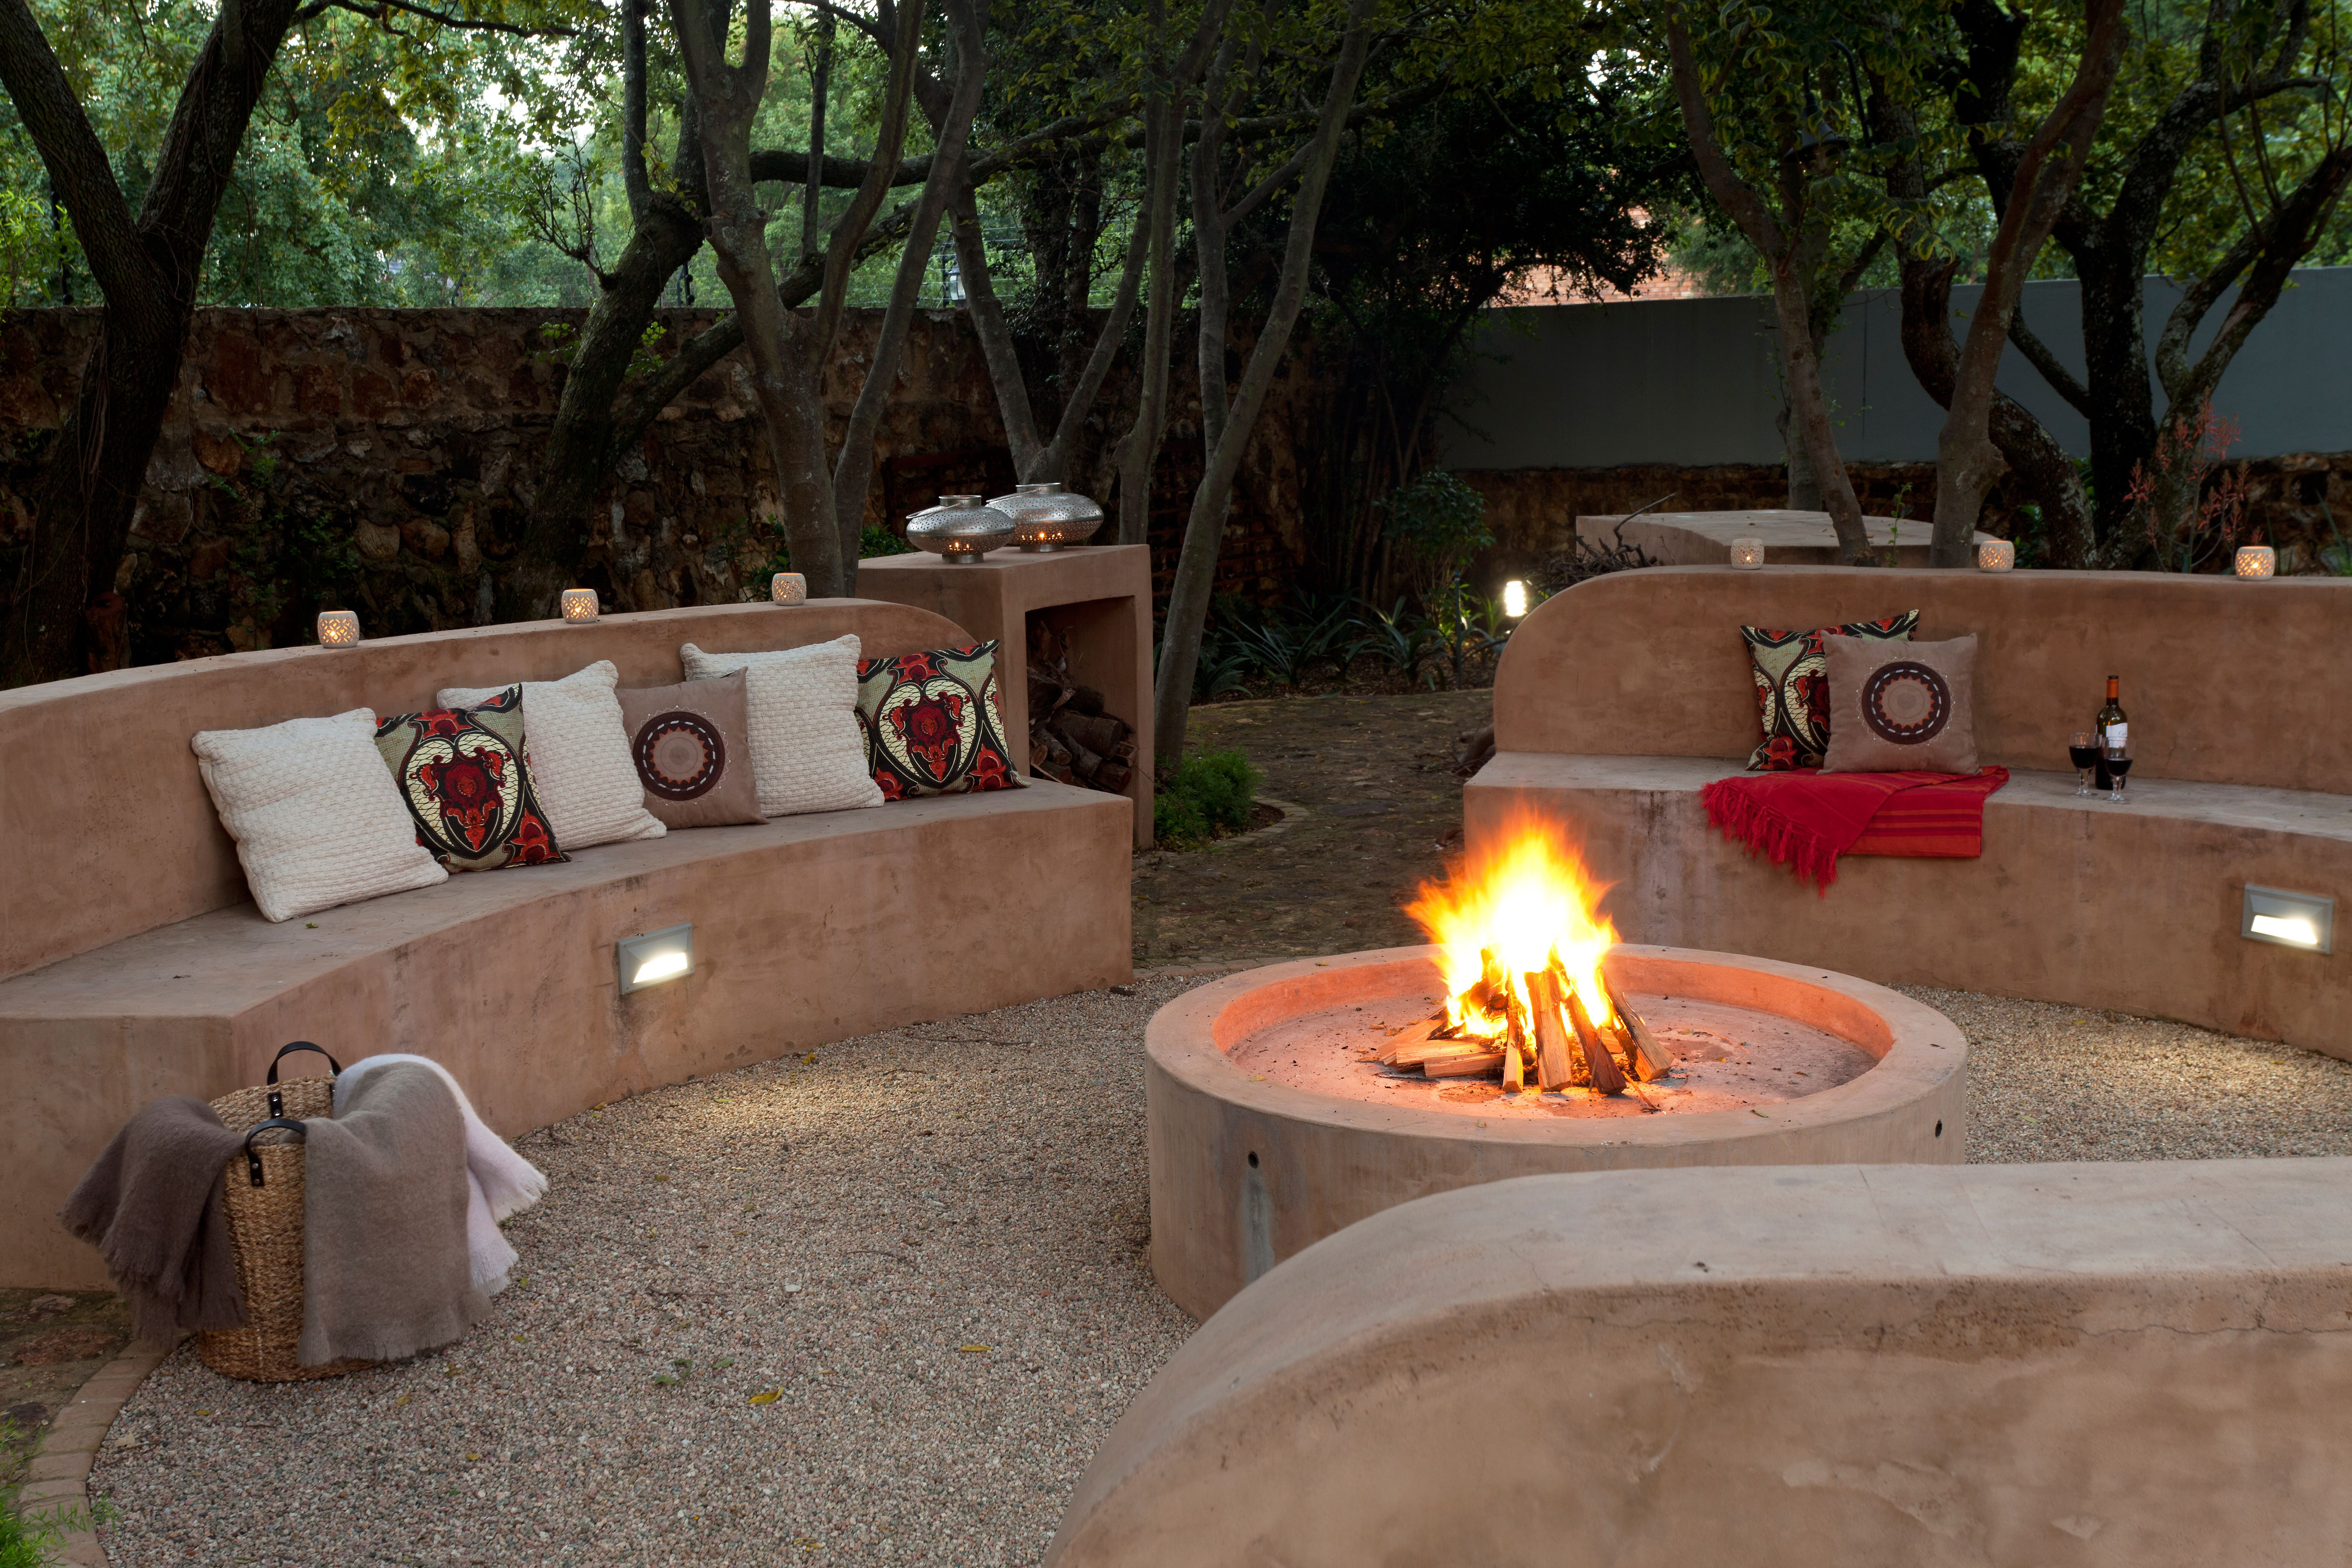 Designing a stylish boma | Outdoor fire, Outdoor decor ... on Garden Entertainment Area Ideas id=81498